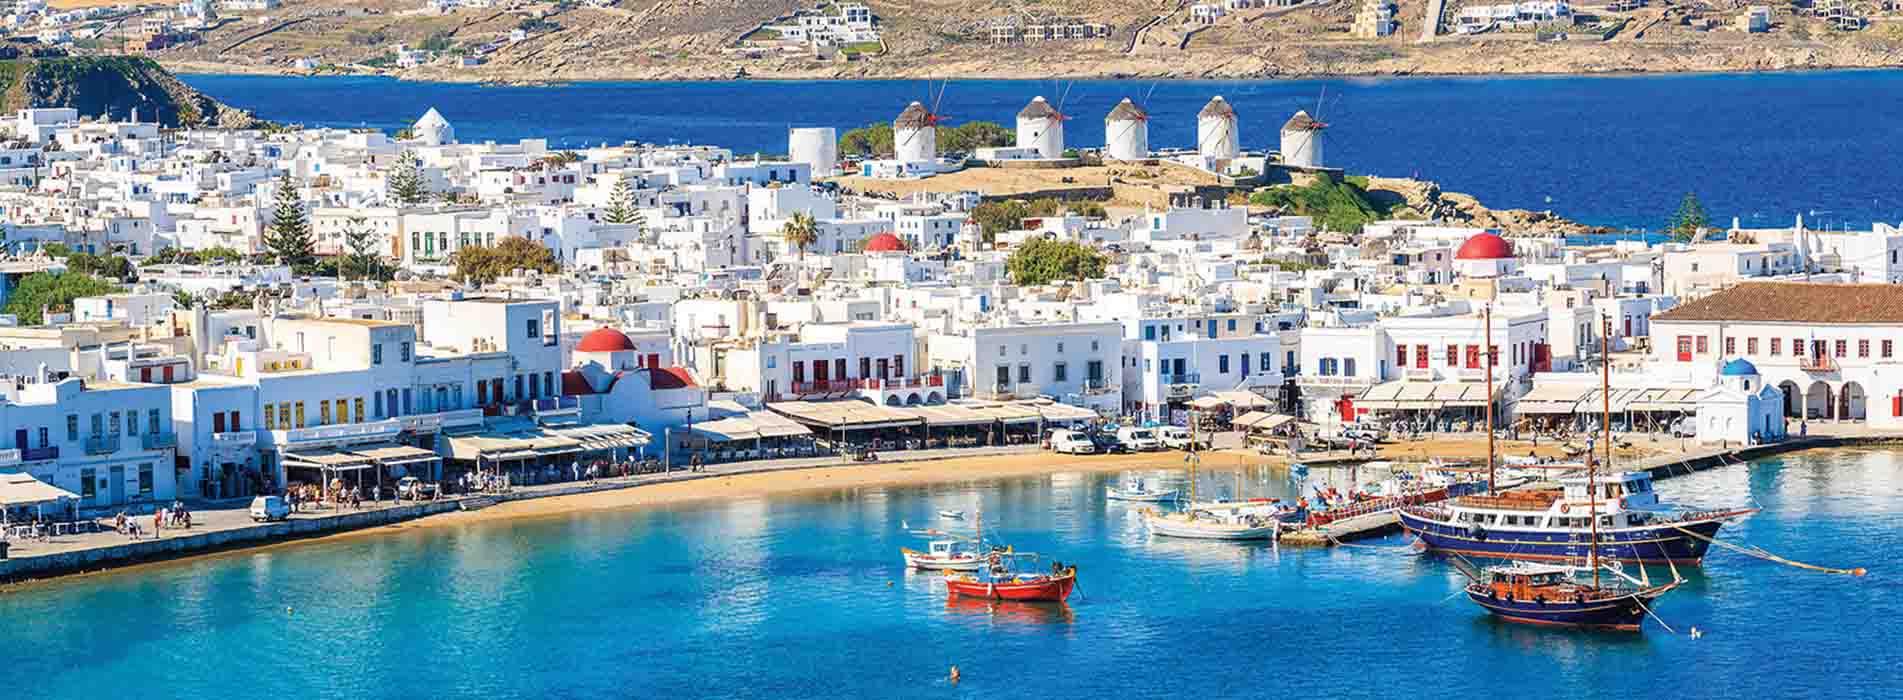 Greece - Mykonos 1 (main)